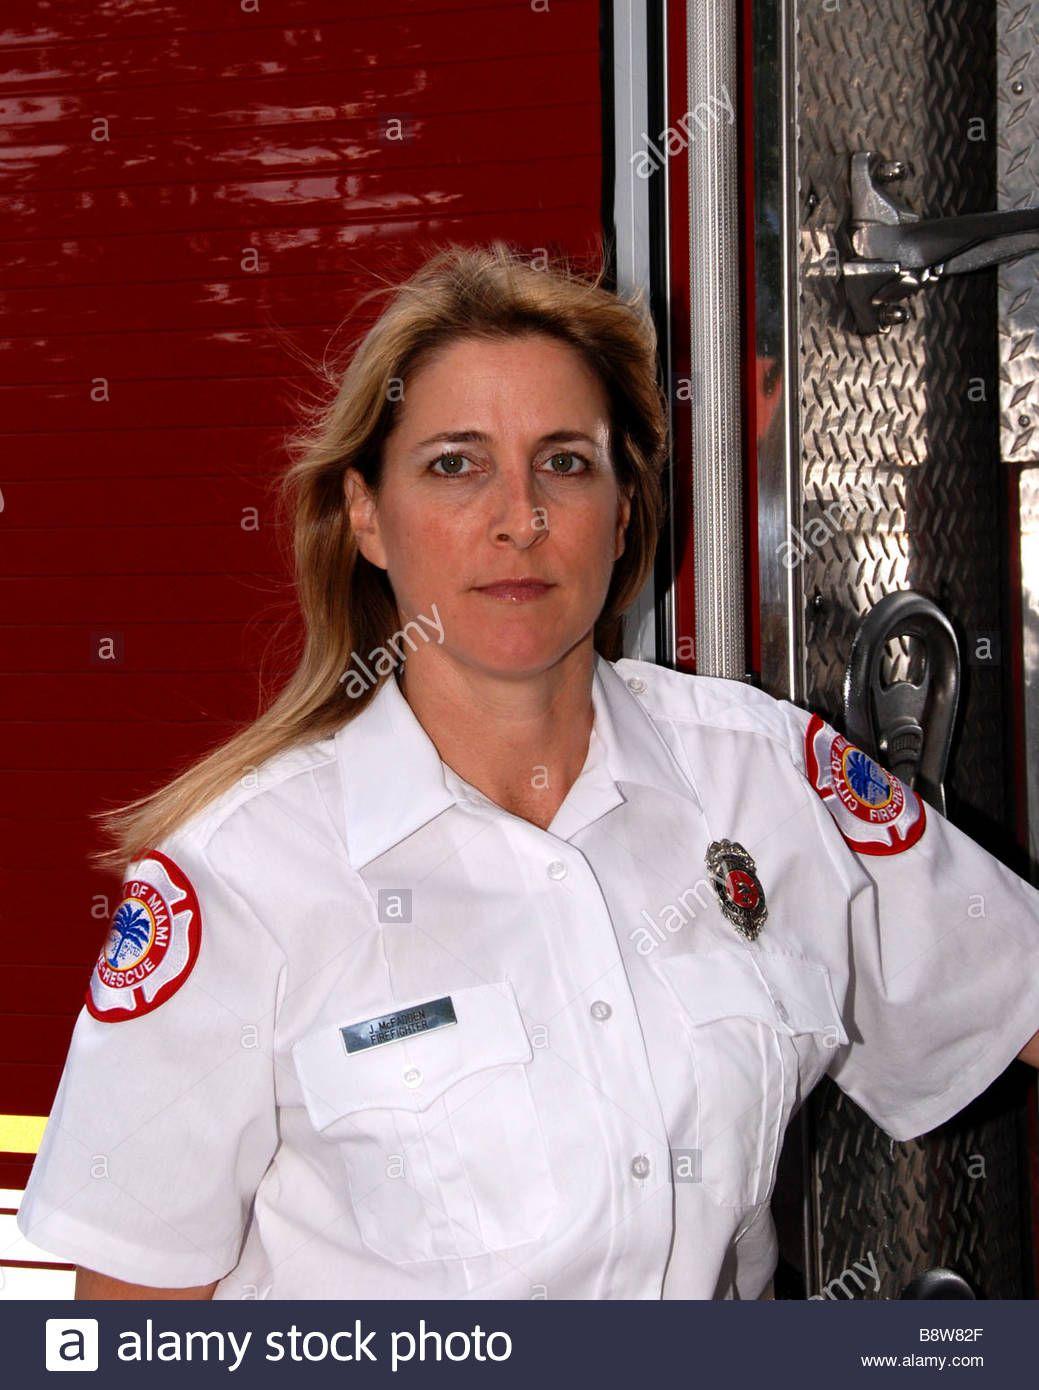 Female firefighter paramedic in dress uniform posing in